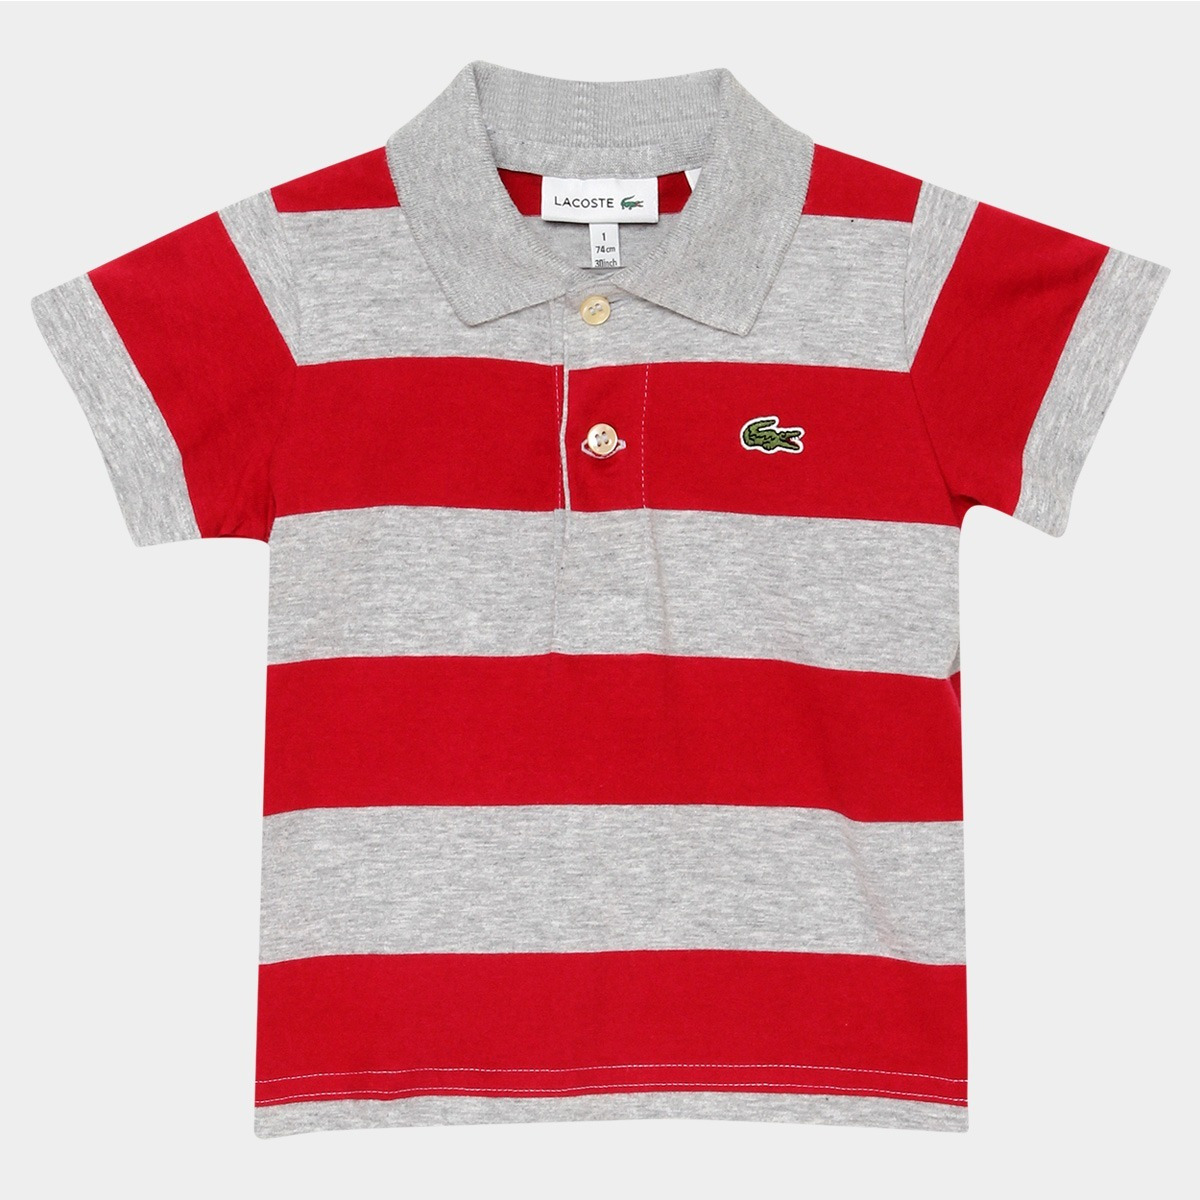 Camisa Polo Lacoste Infantil Listras Cinza   Vermelha - R  159,99 em ... b3affd0802